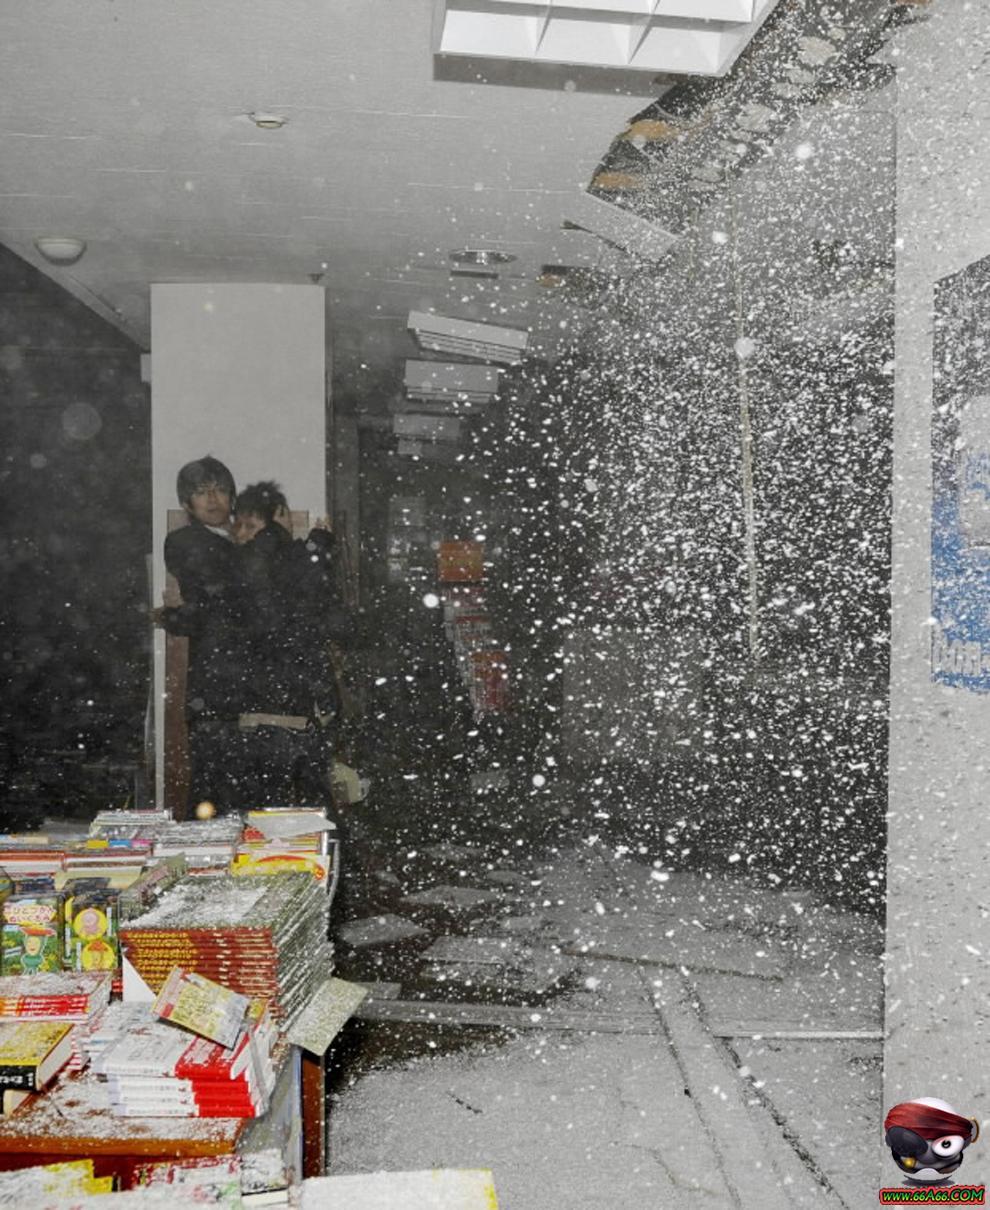 صور زلزال اليابان domain-c5cbeac70a.jp